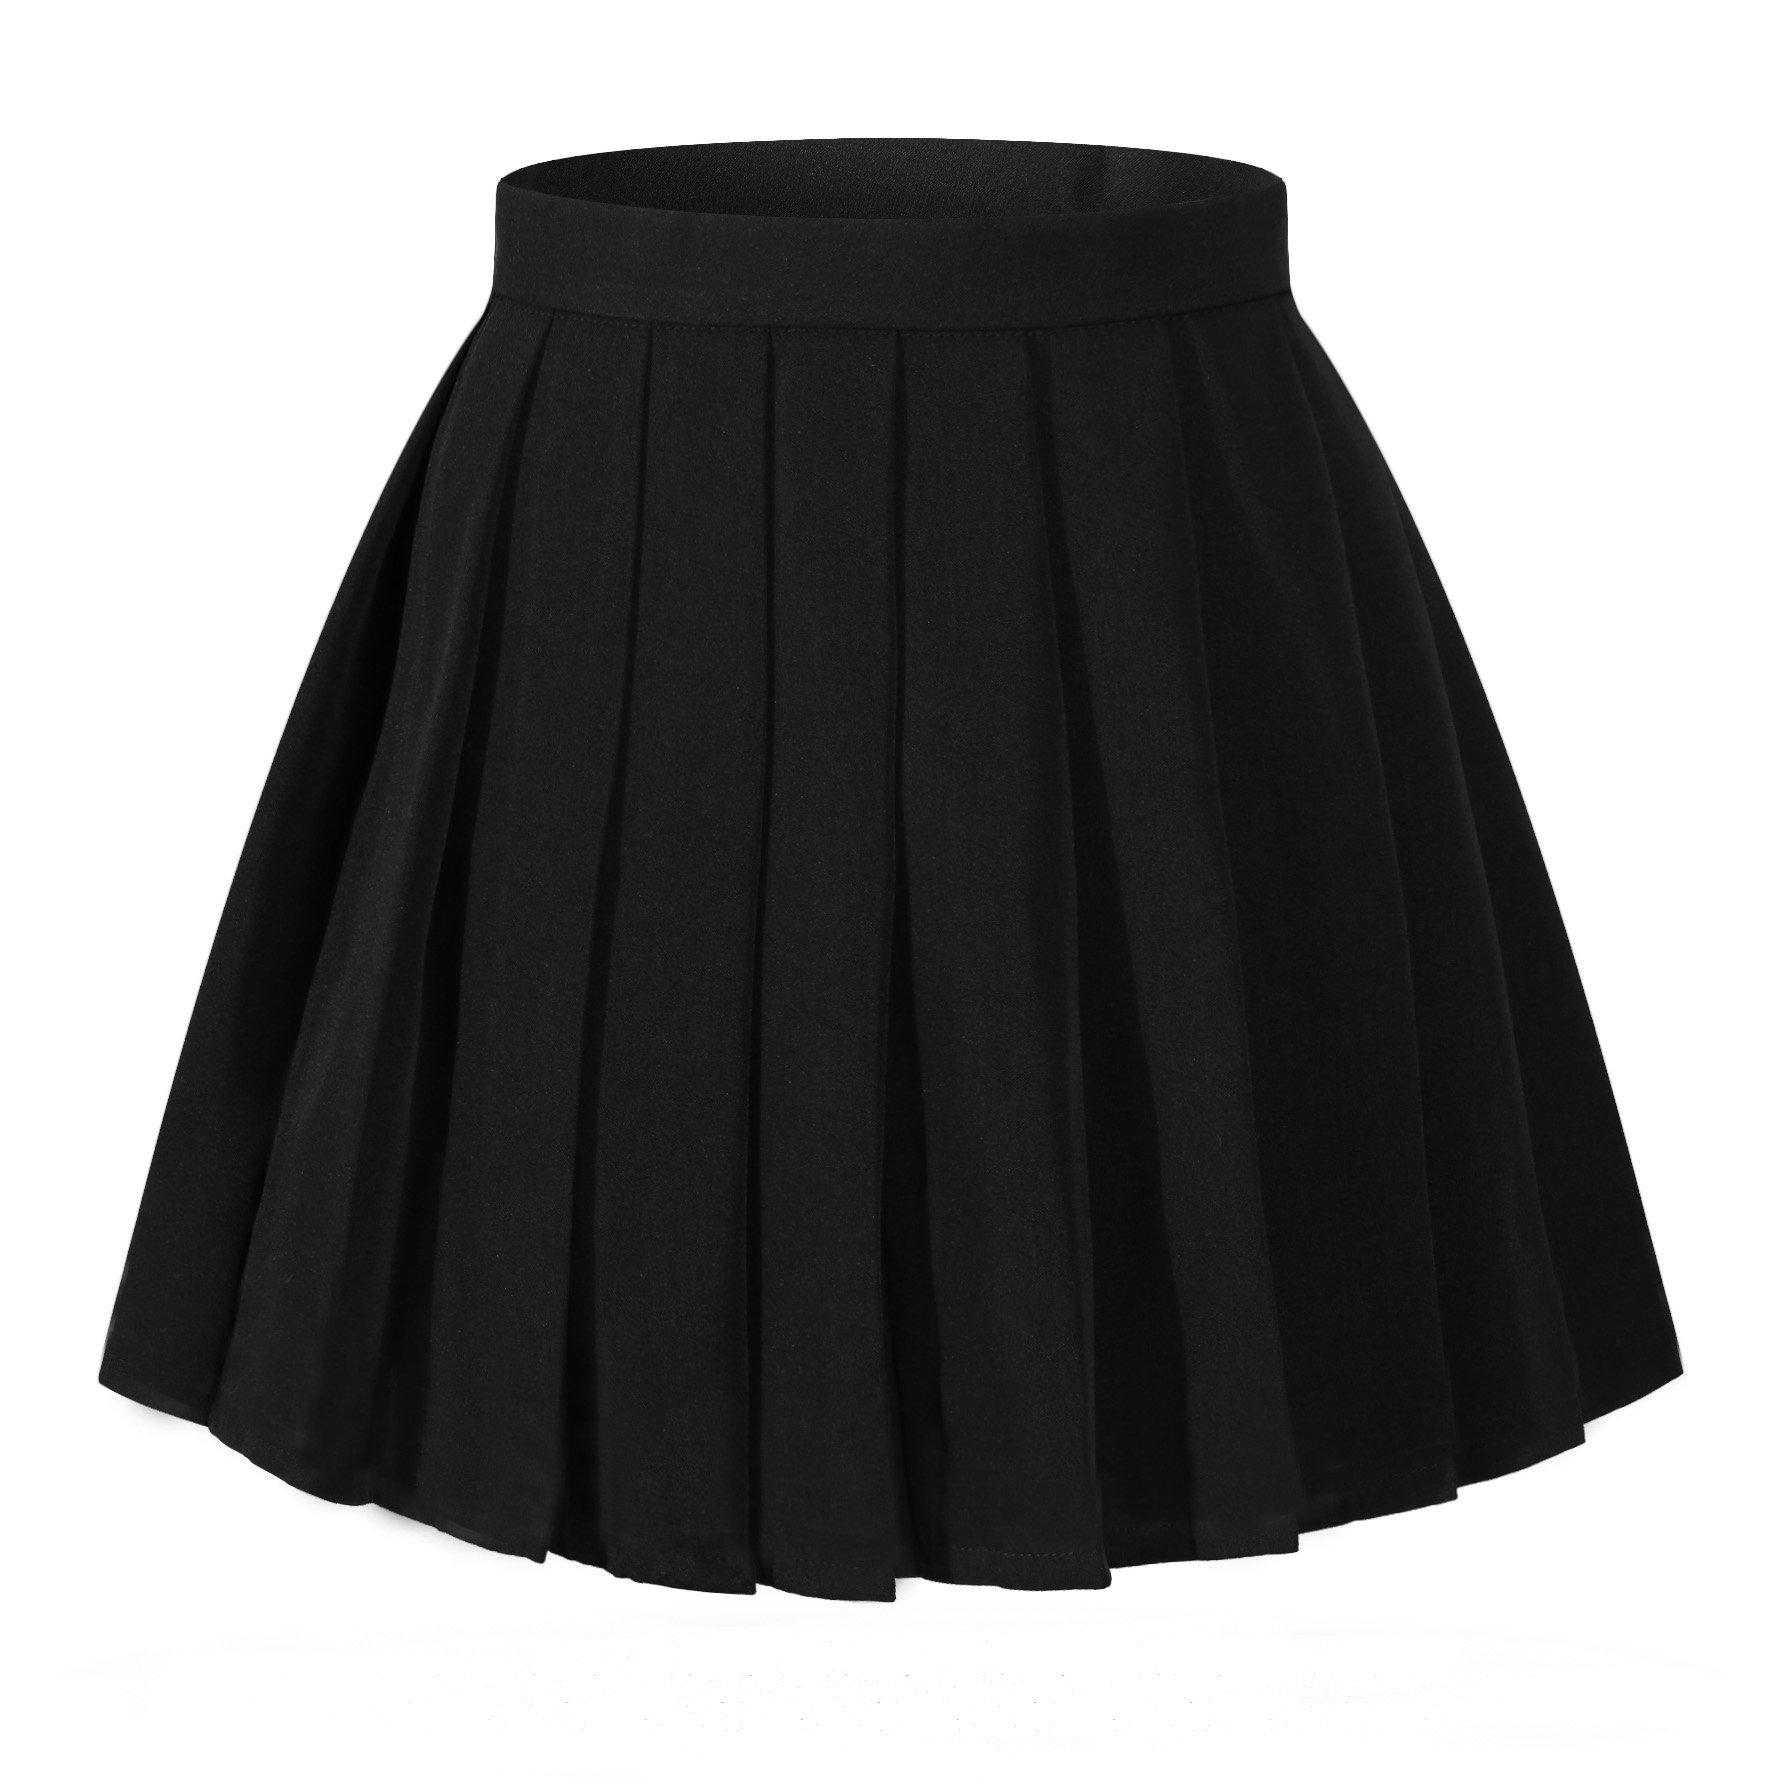 Beautifulfashionlife Women`s Flared Vintage Pleated High Waist Pleated Skirts(XL,Black)